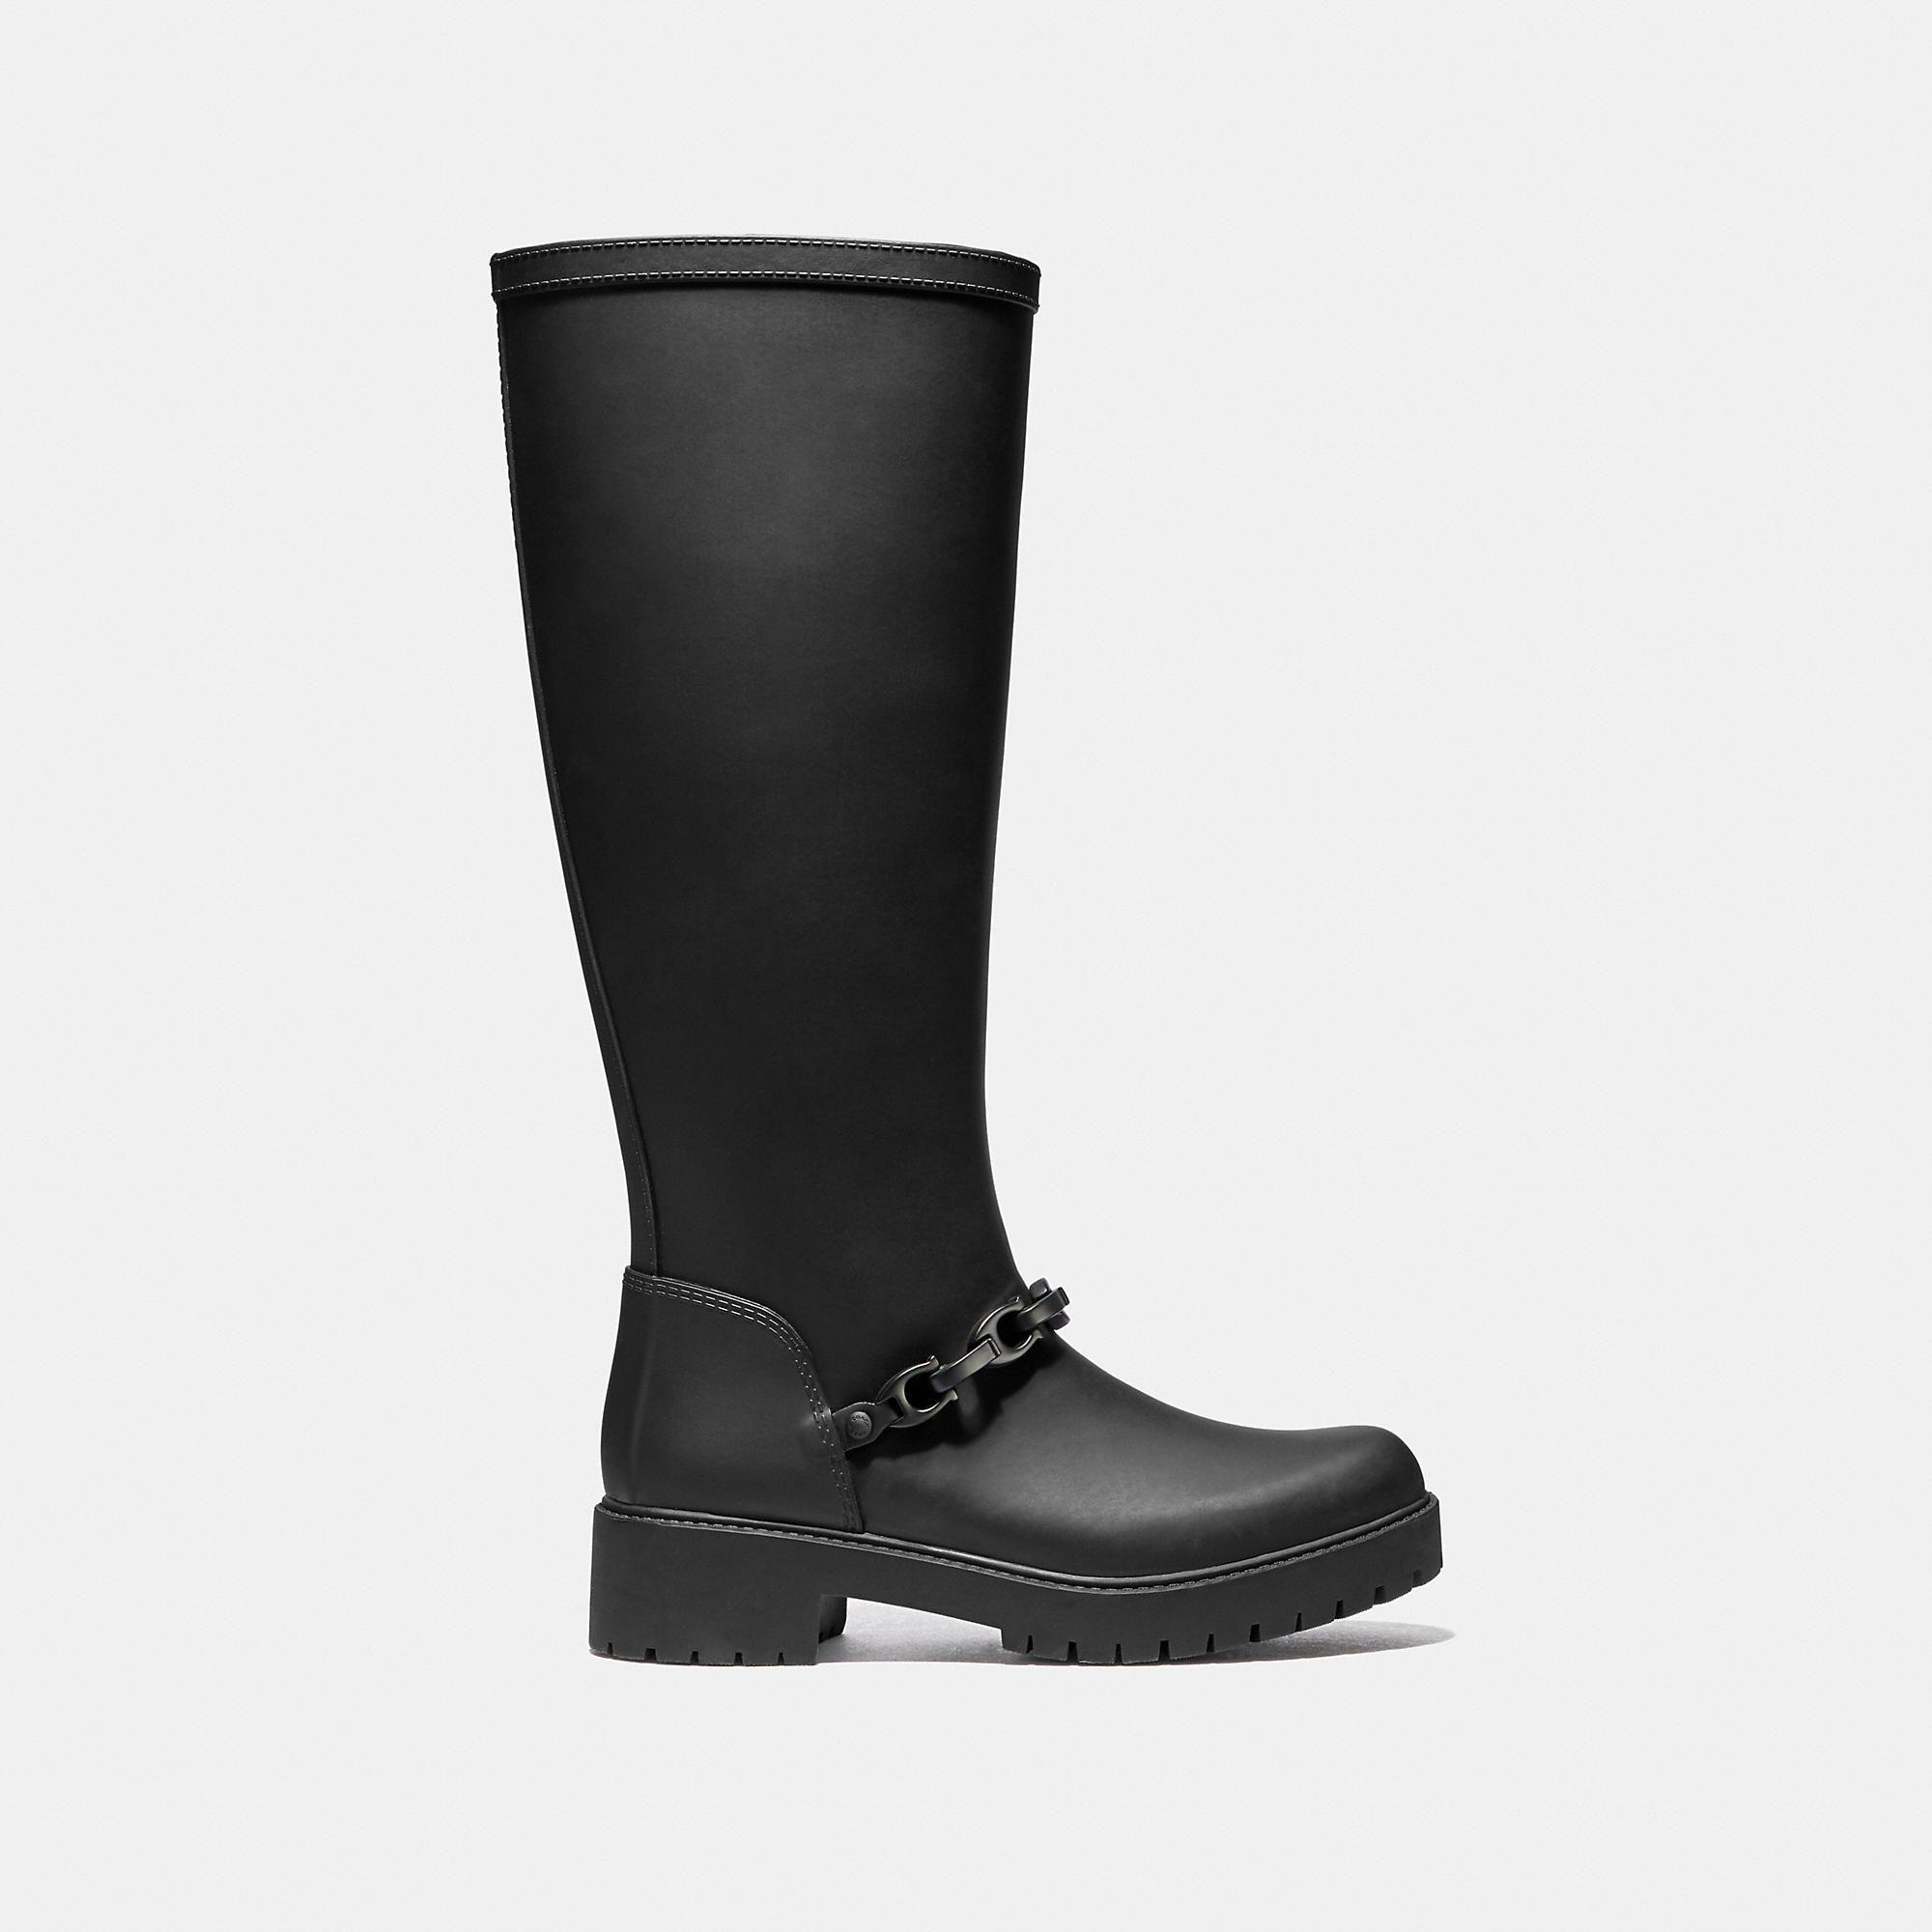 19e1194b COACH Westerly Tall Rain Boot - Women's Size 10 | Products | Coach ...